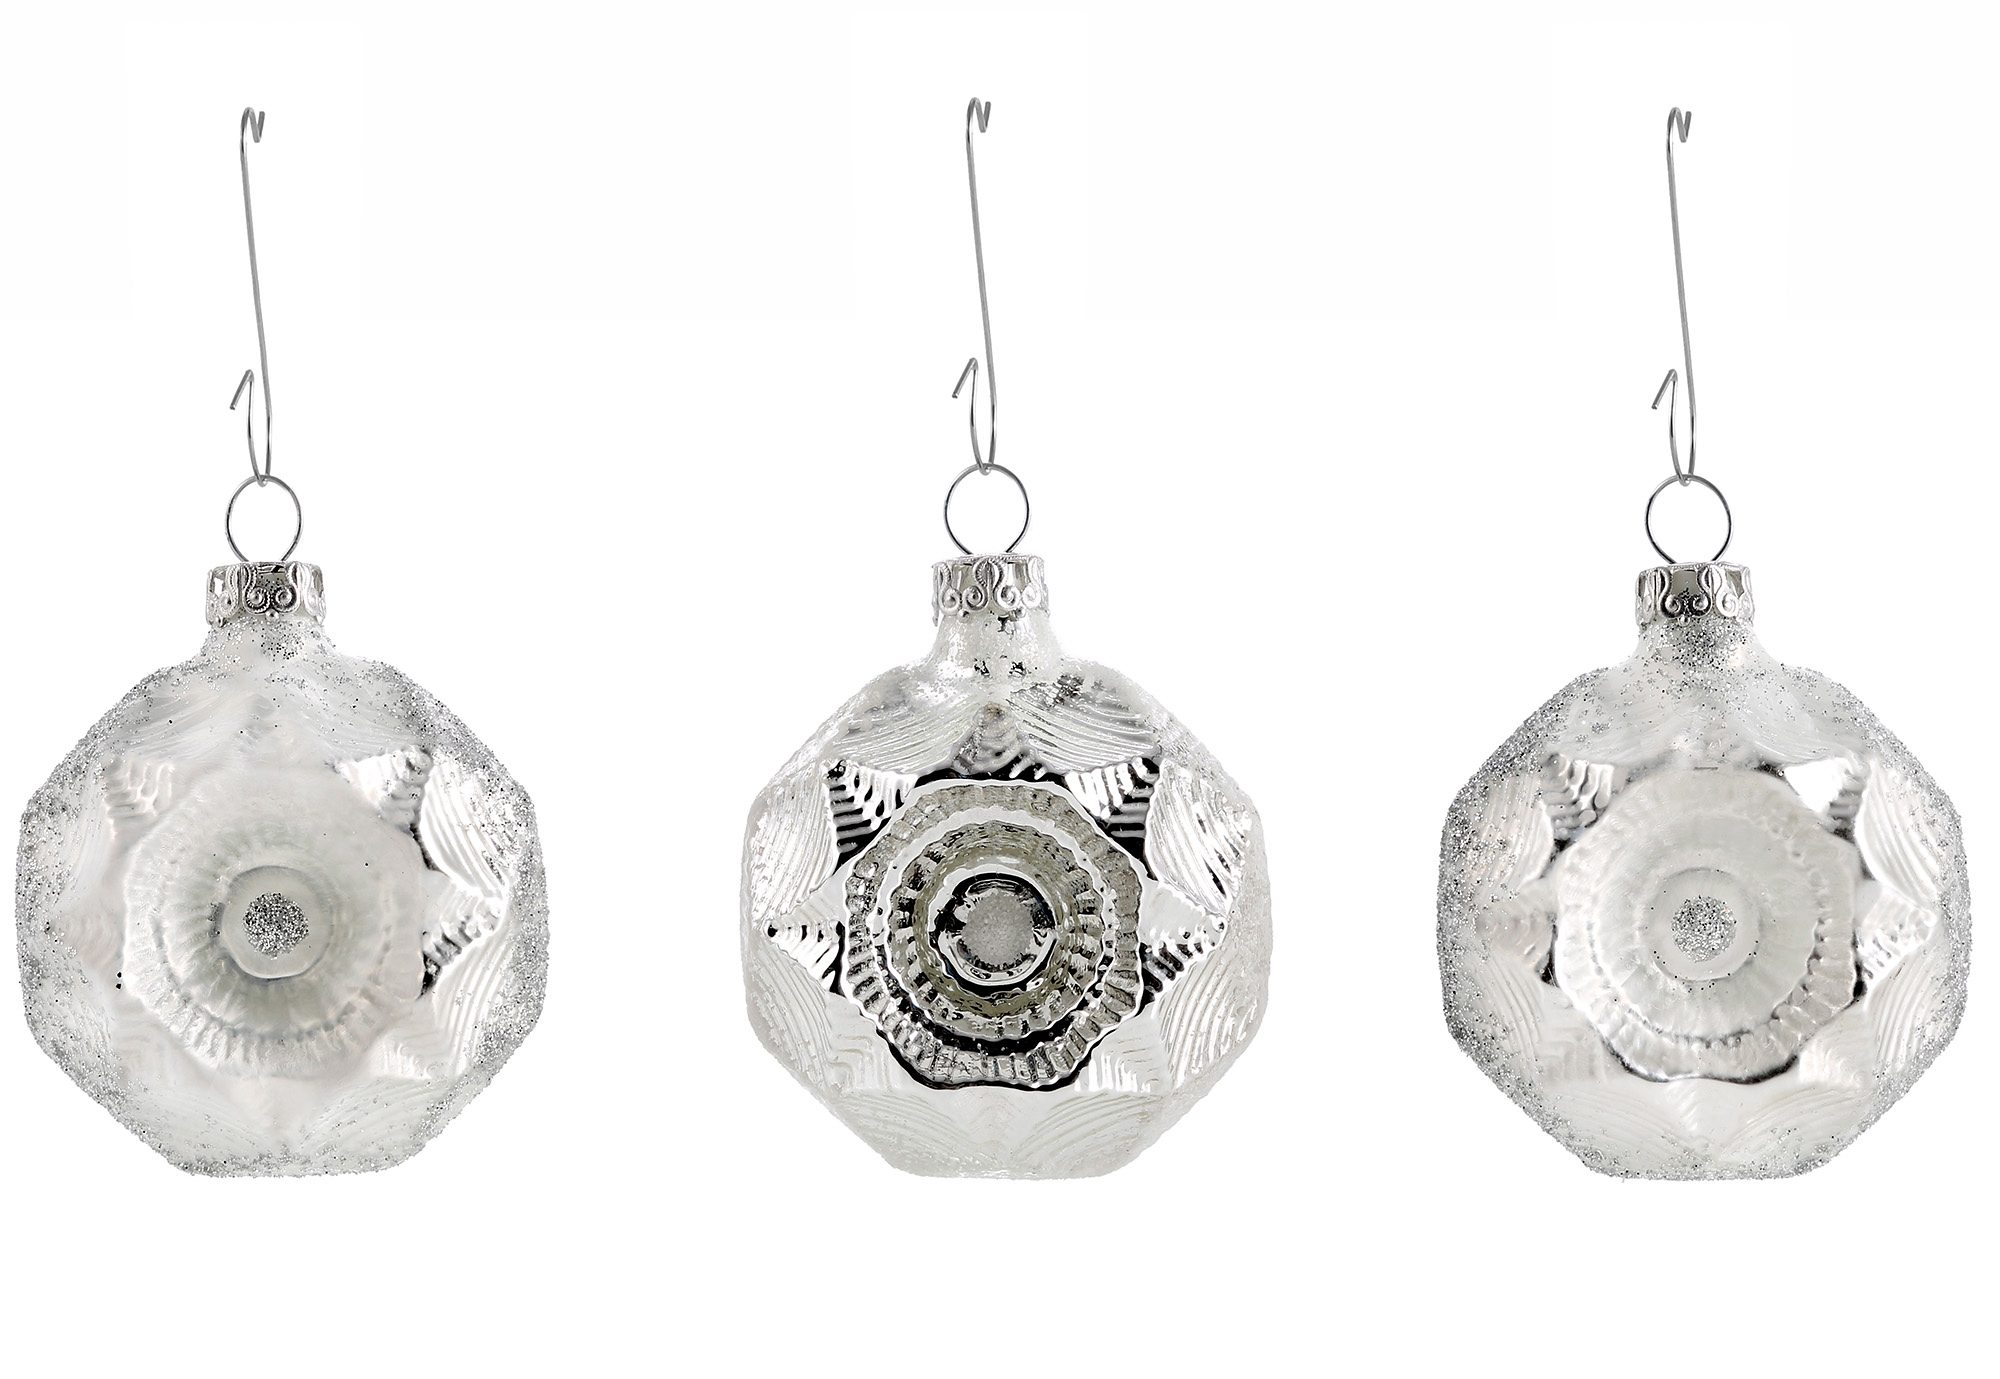 Thüringer Glasdesign Set: TGS-Christbaumschmuck Medaillons, »Eisprinzessin« (6tlg).